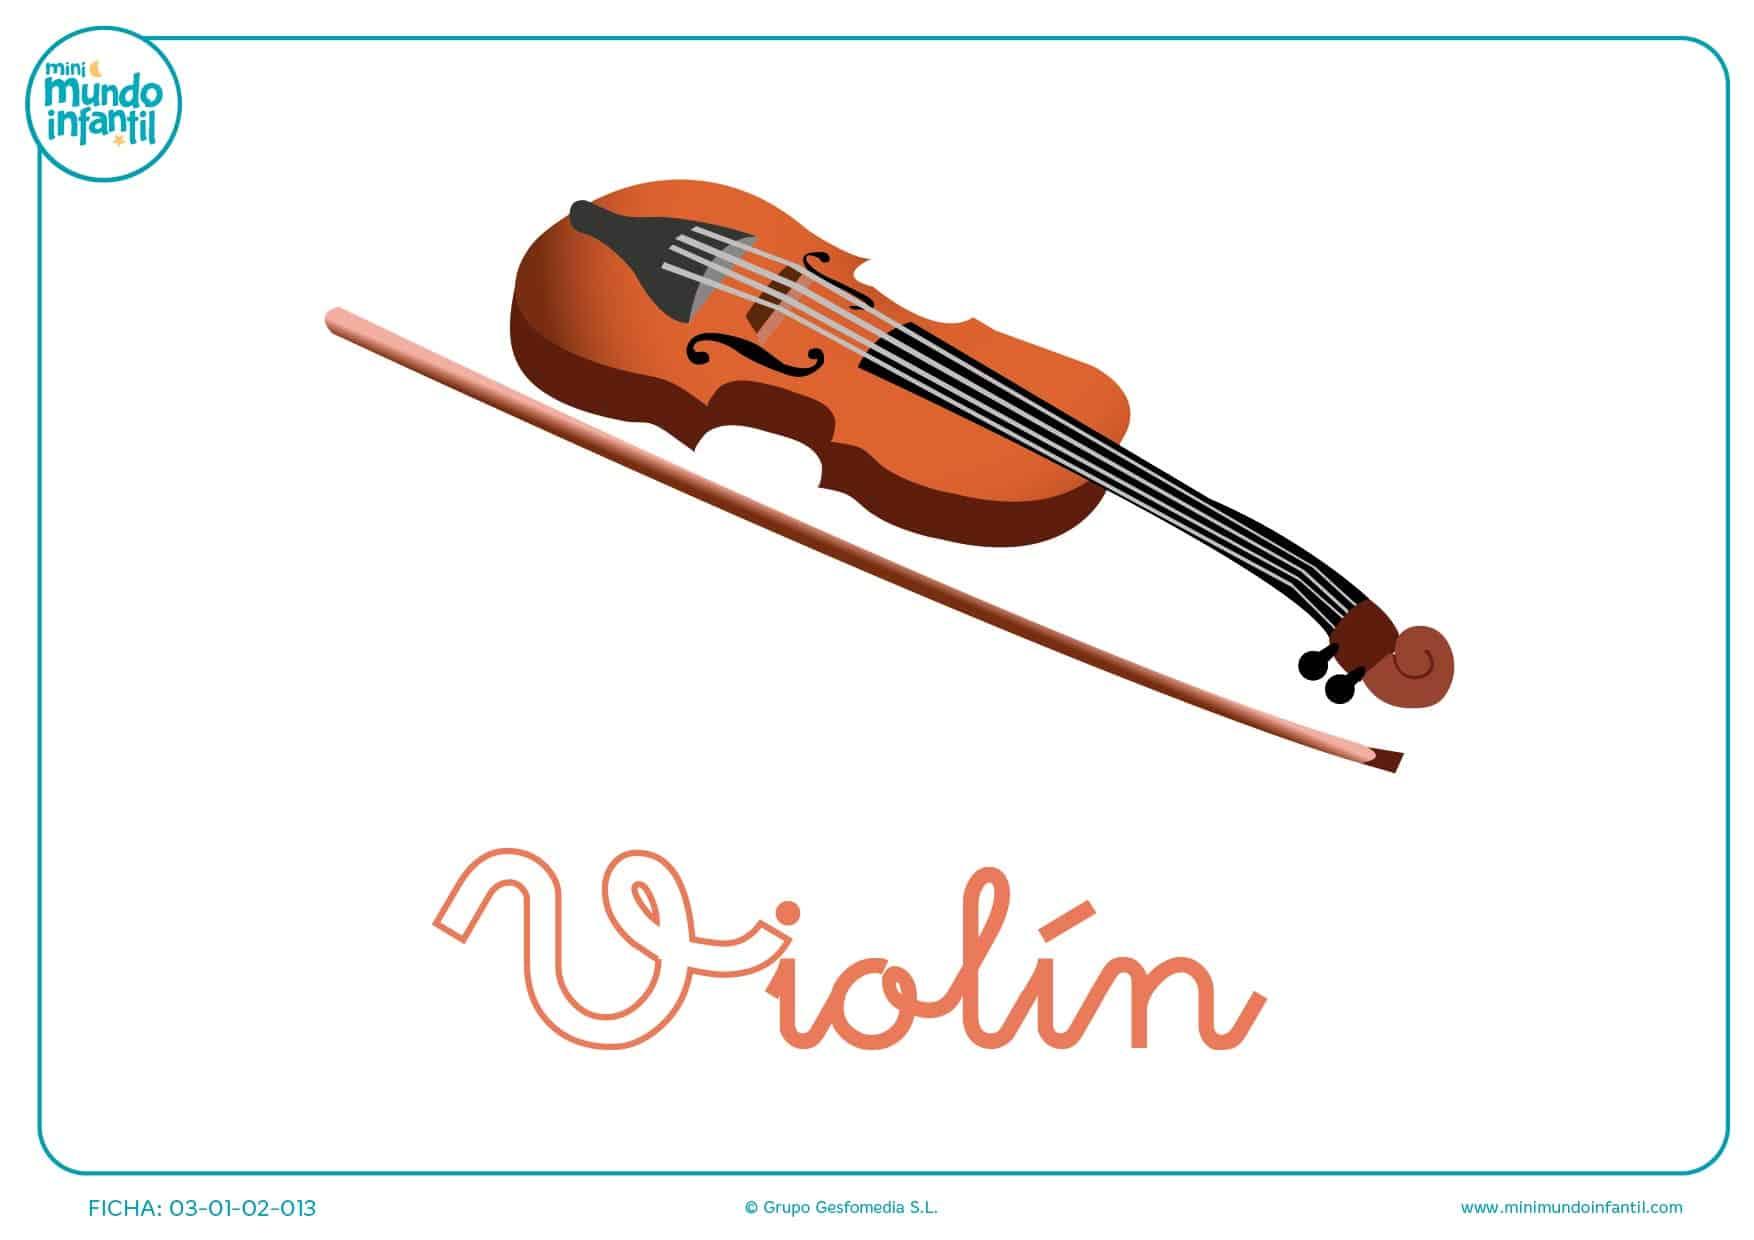 Pintar la letra V minúscula de violín